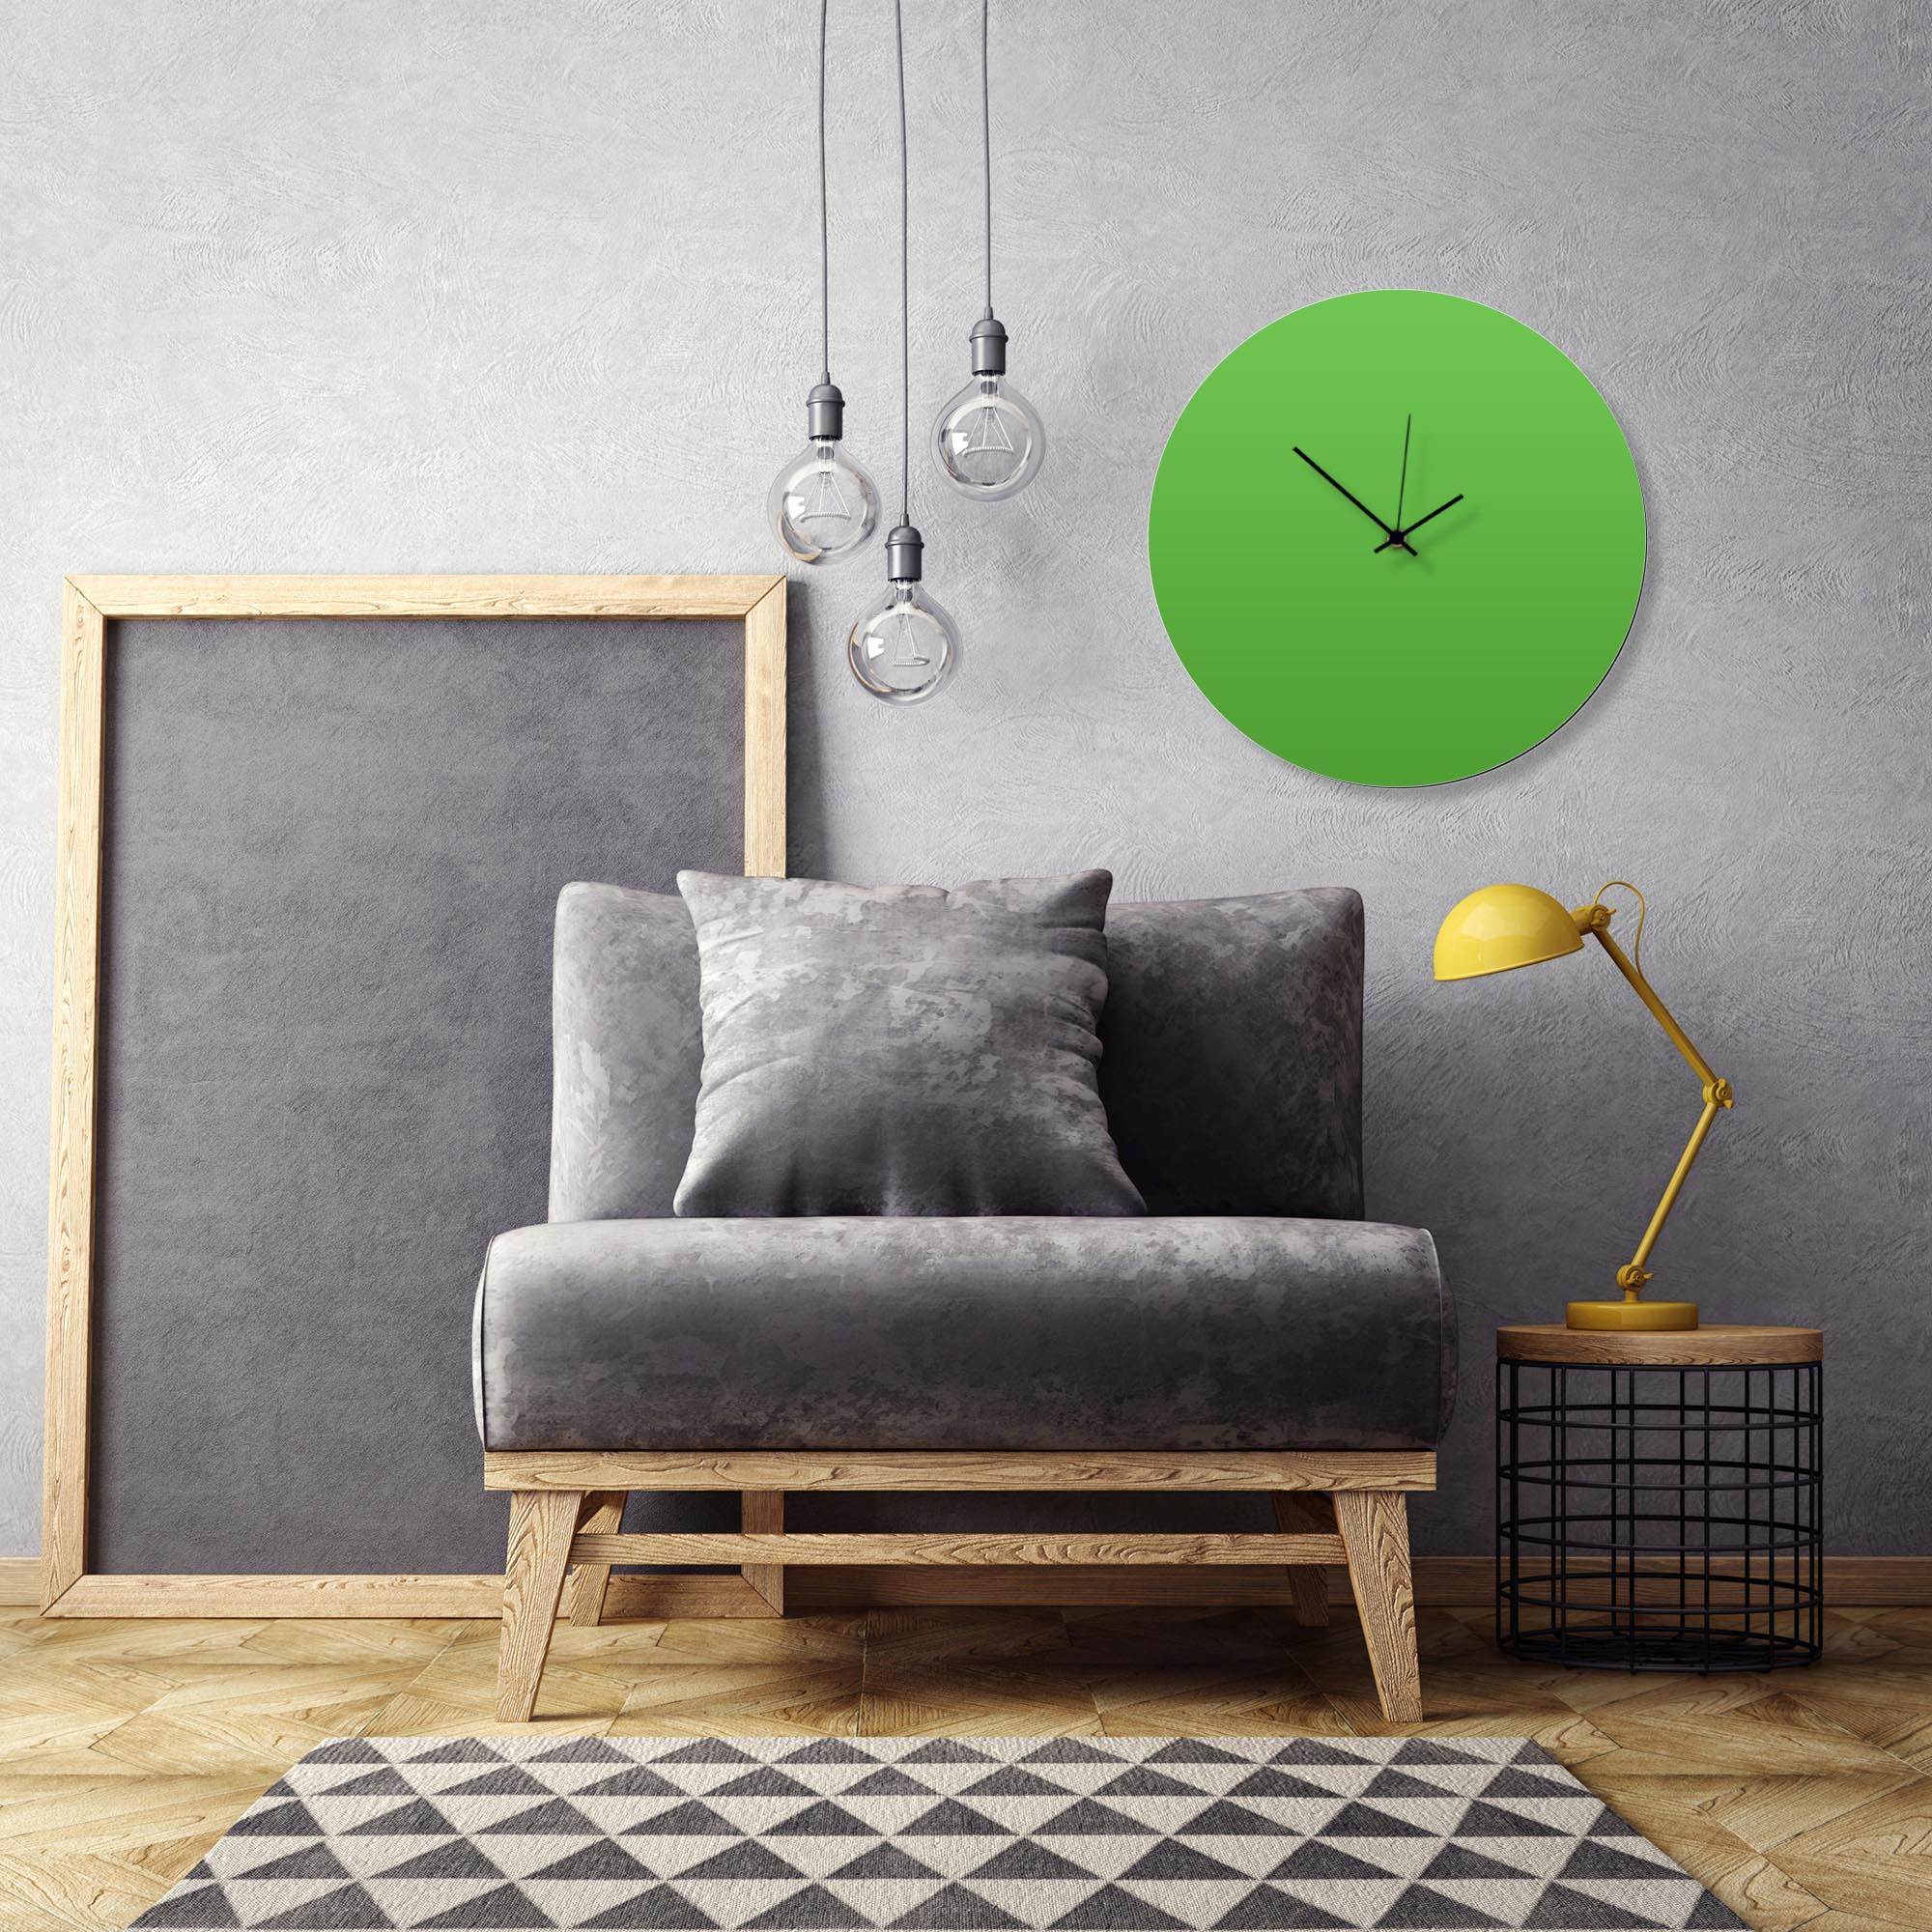 Greenout Black Circle Clock Large by Adam Schwoeppe Contemporary Clock on Aluminum Polymetal - Alternate View 1